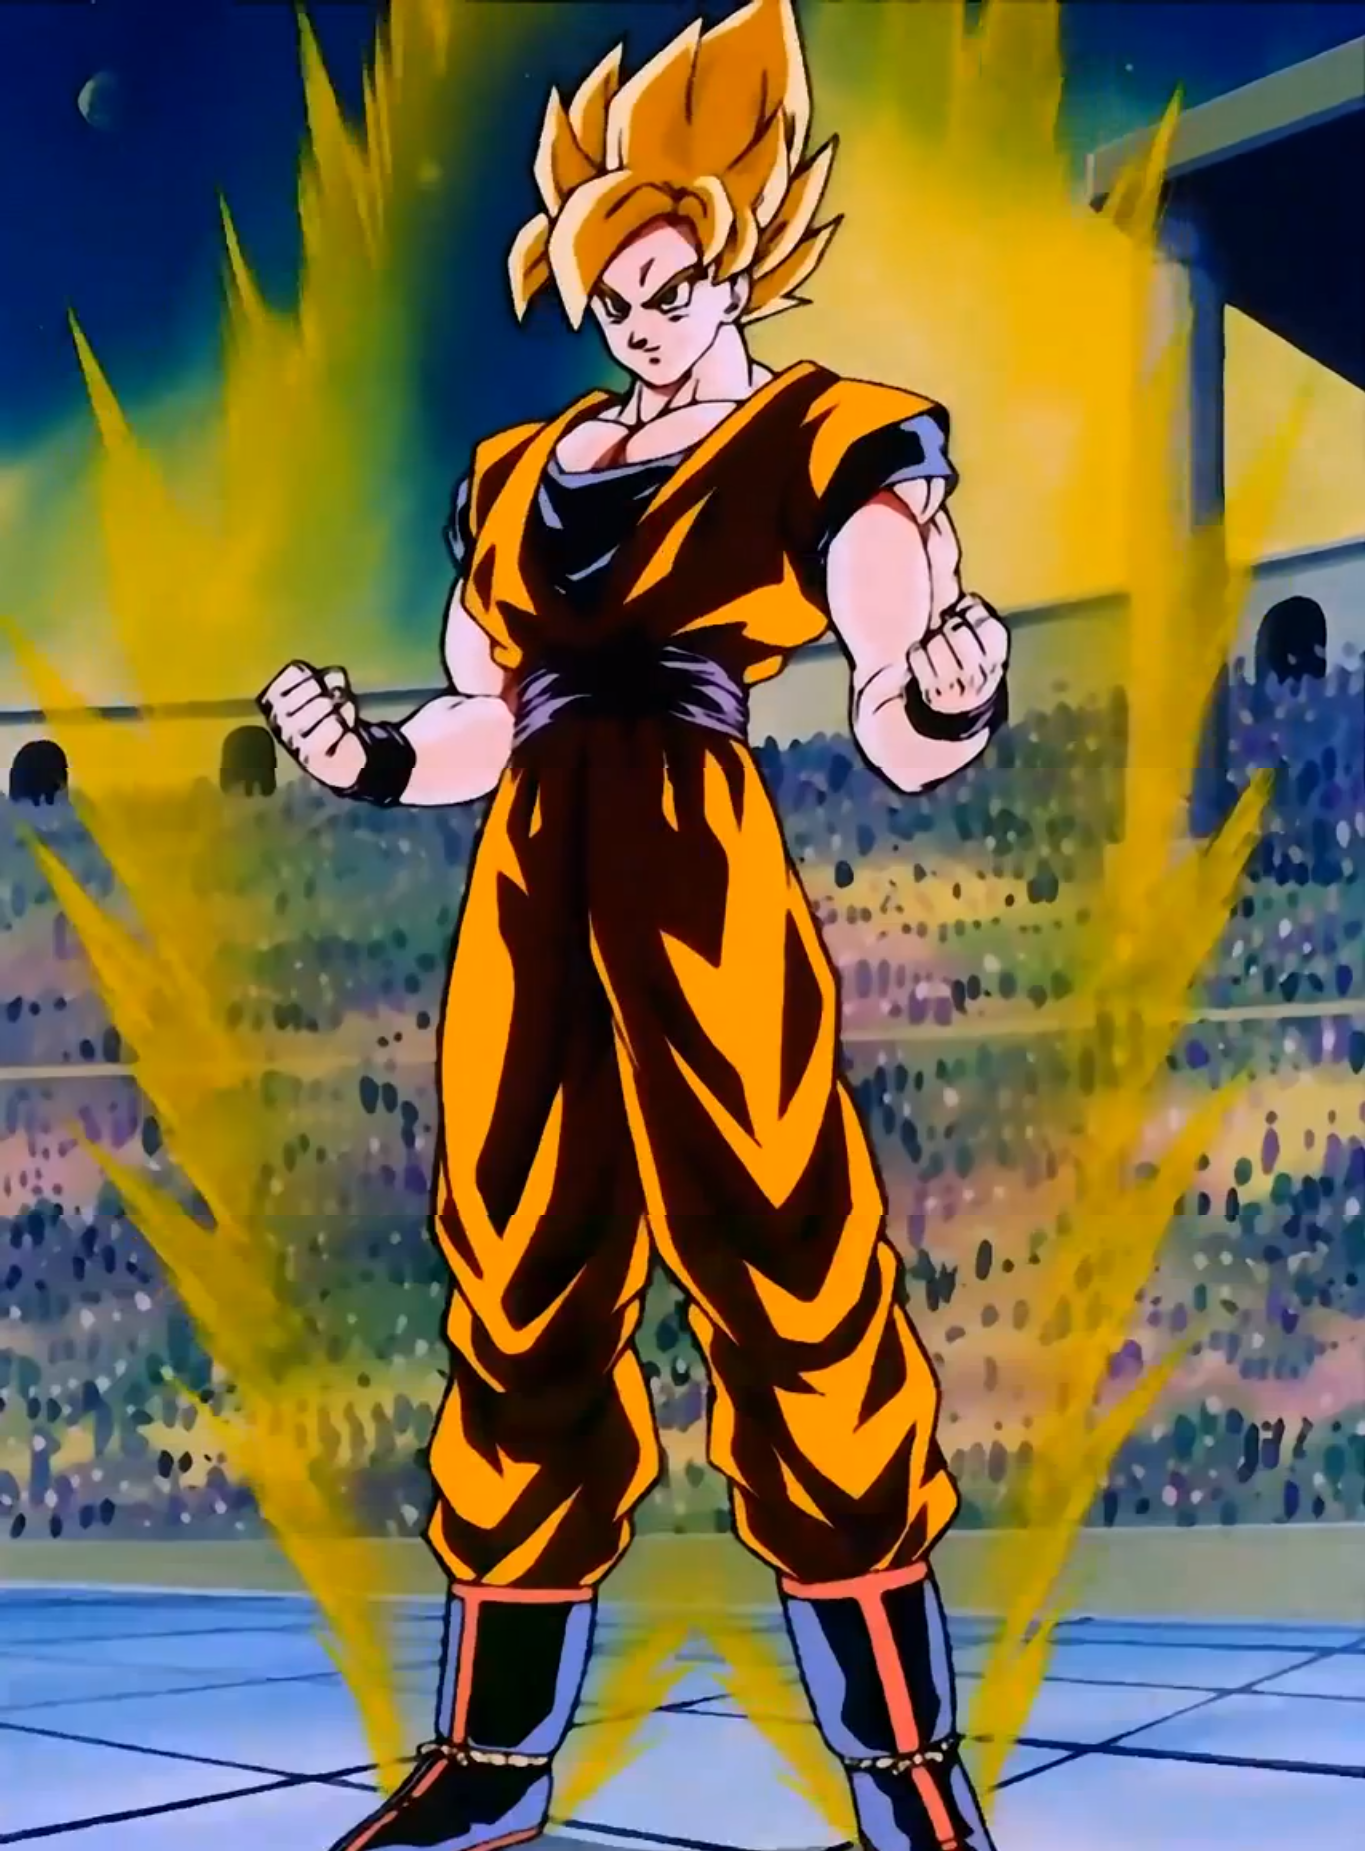 Goku vs pikkon dragon ball wiki - Super saiyan 6 goku pictures ...